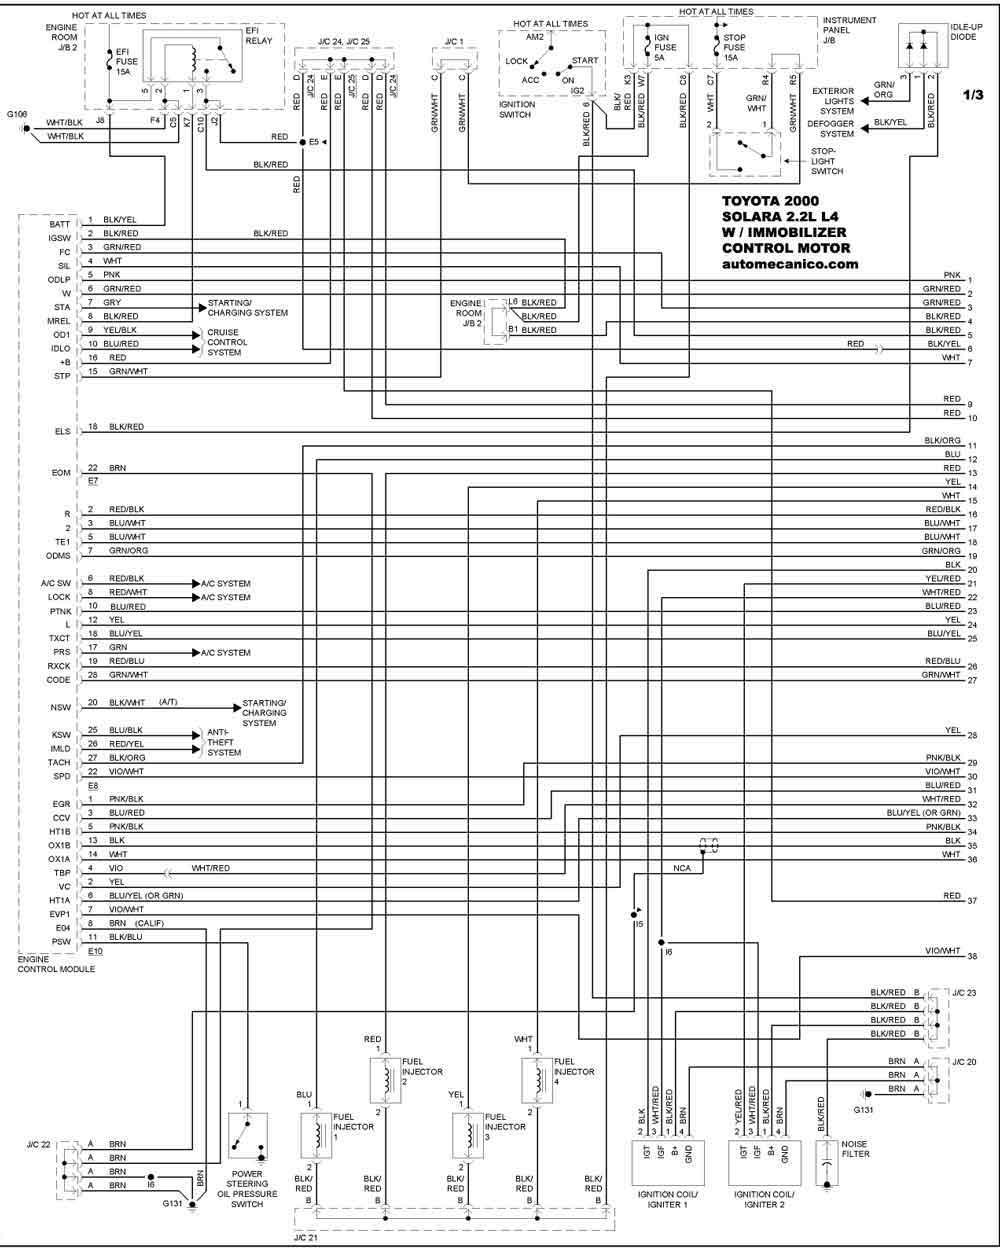 2000 toyota rav 4 Diagrama del motor